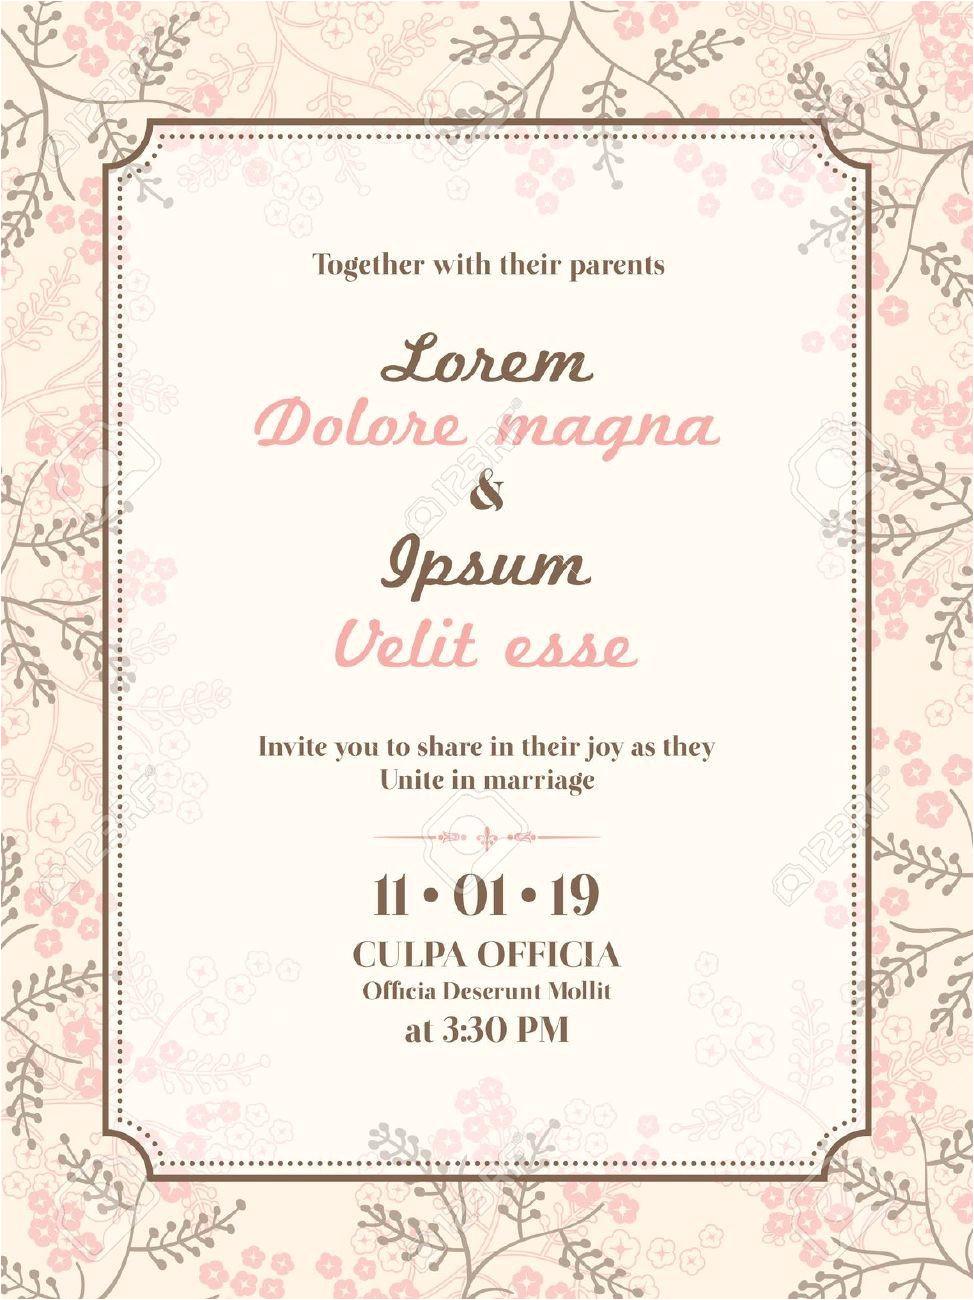 Simple Invitation Card for Wedding Marriage Invitation Cards Dengan Gambar